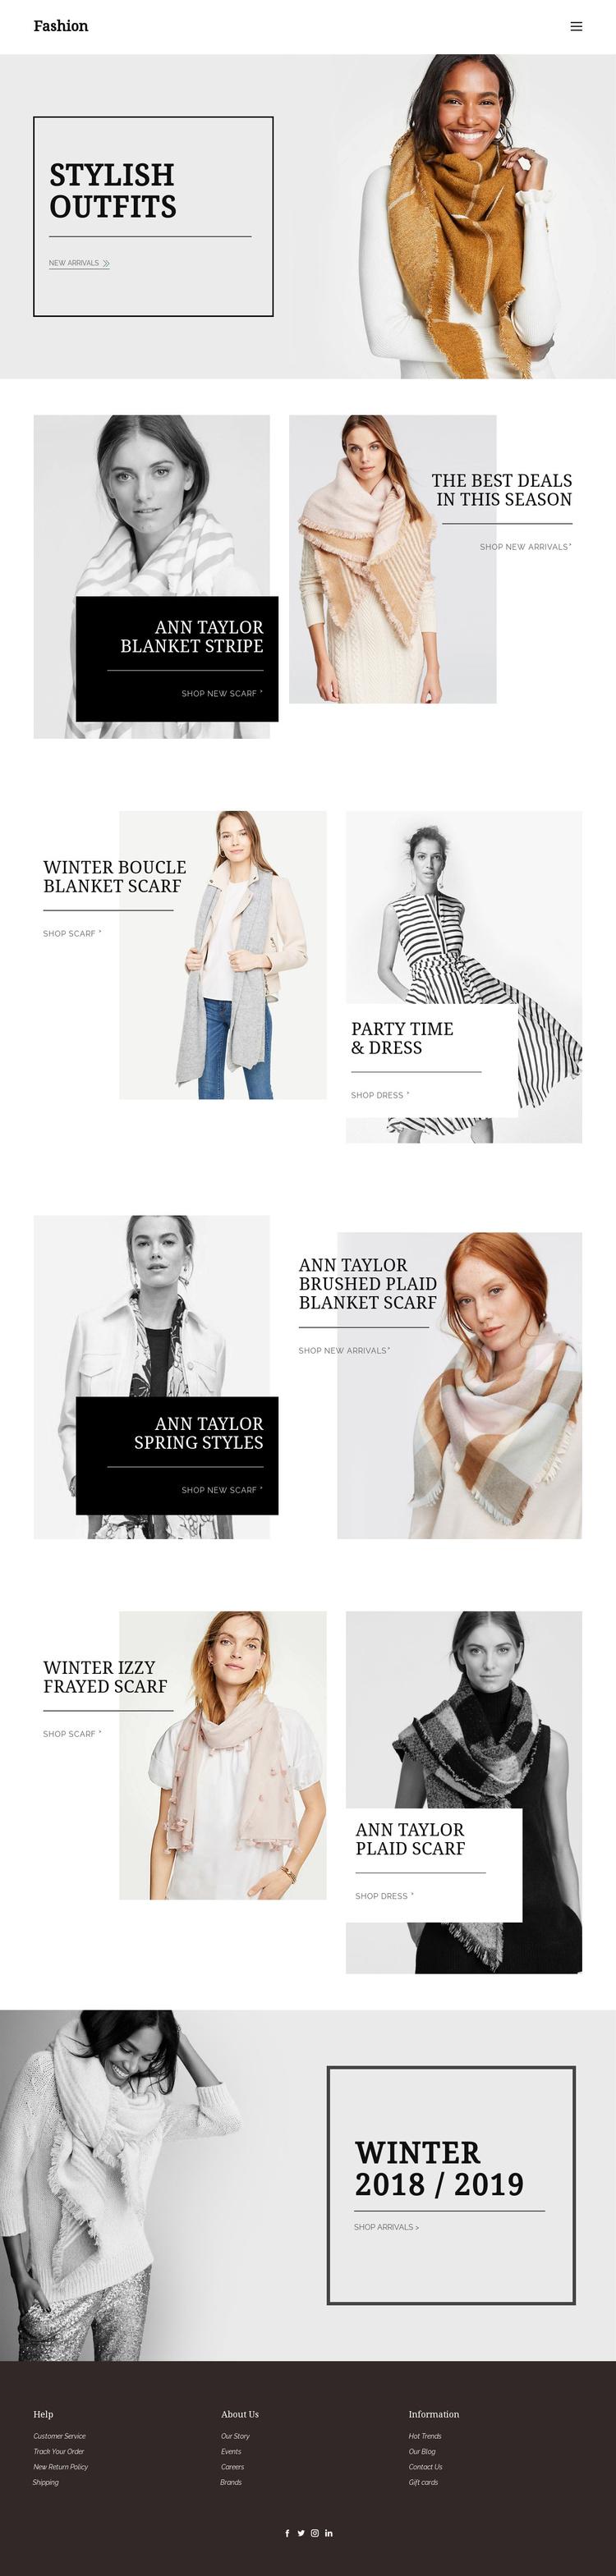 Personal shopper service Joomla Template